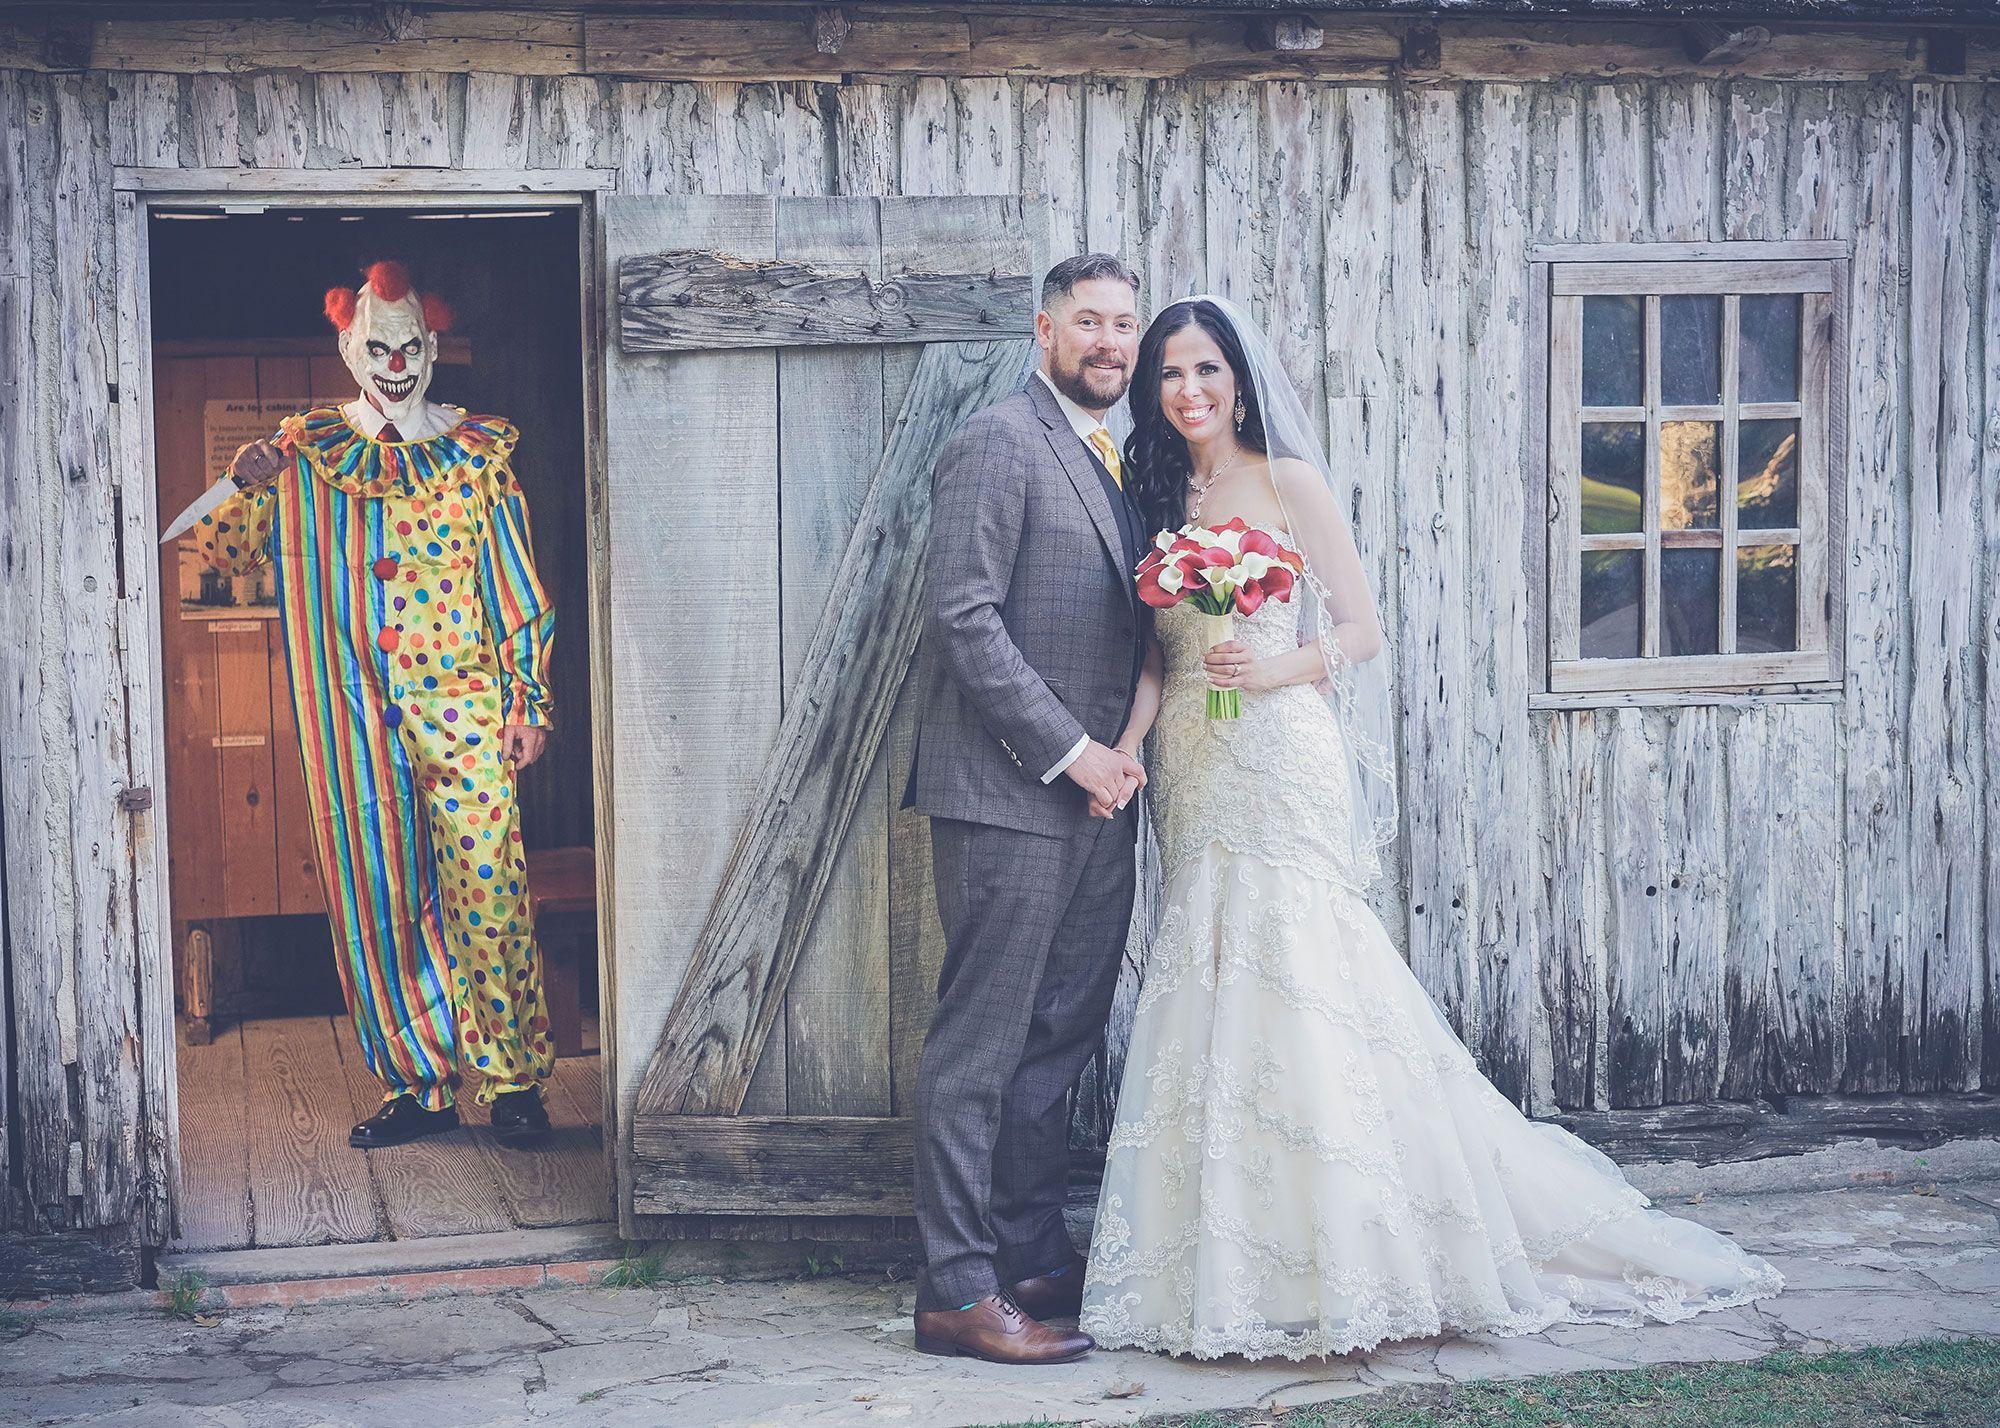 Creepy Clown Photobomb Wedding Photos Funny Wedding Pictures